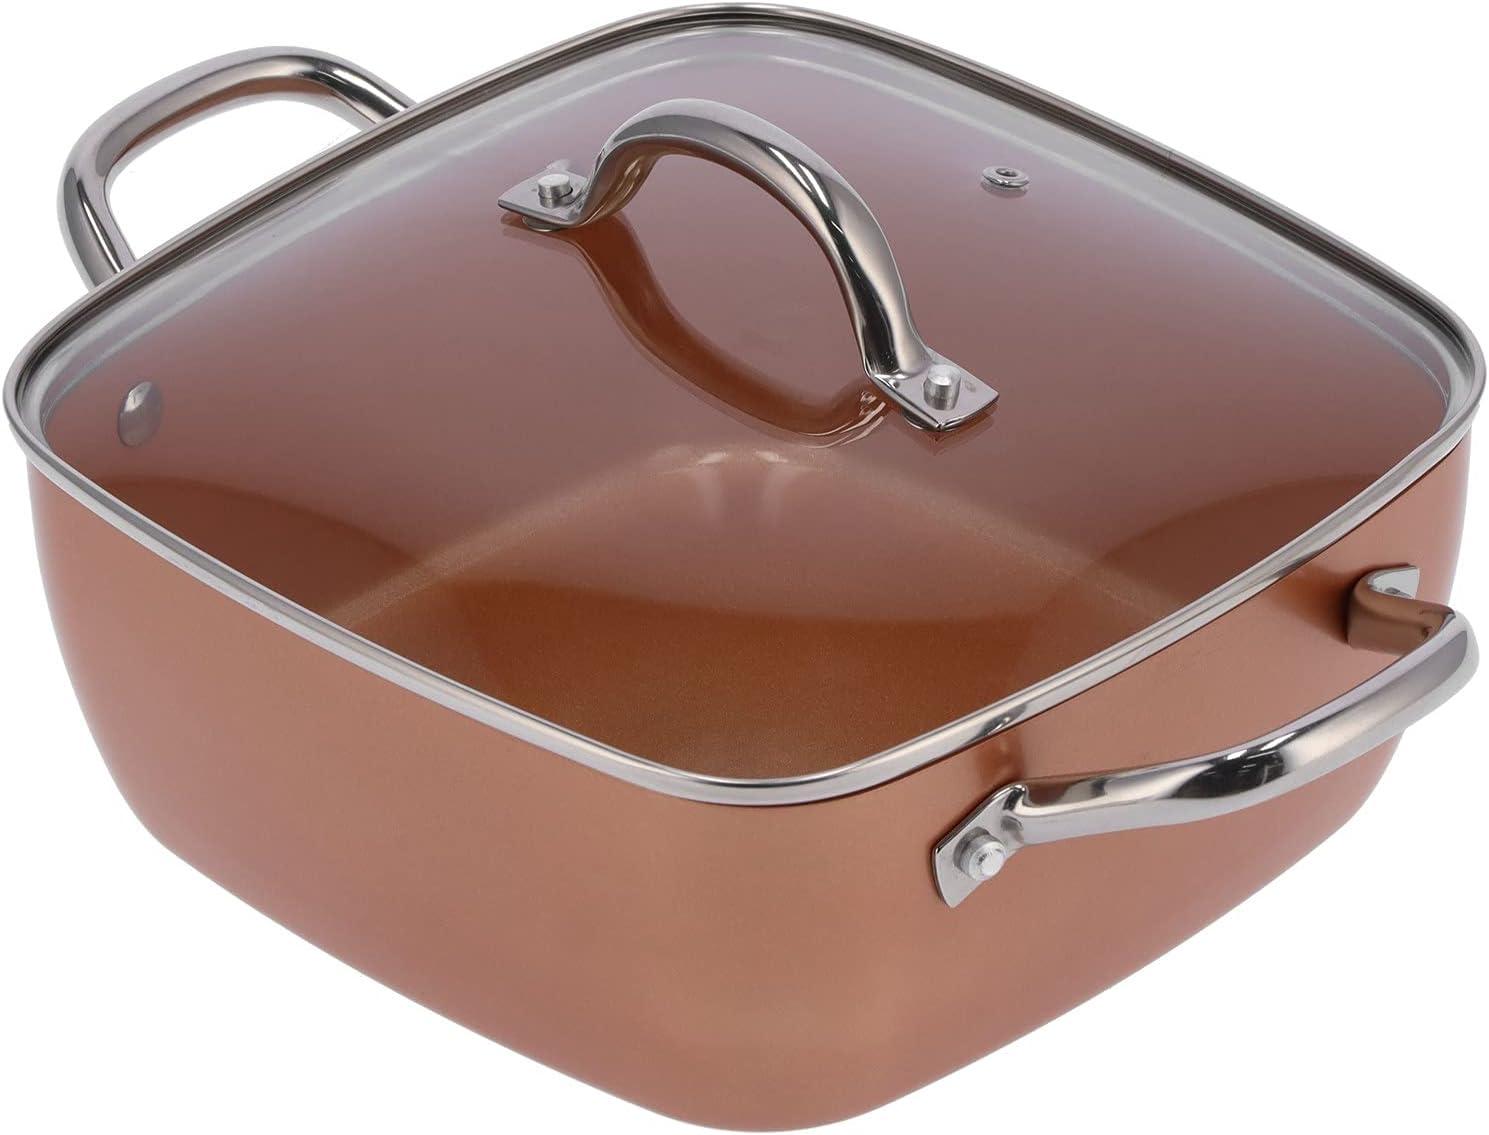 Wok Pan Easy To Clean Finally Regular discount resale start for Restaura Non-Stick Non‑toxic